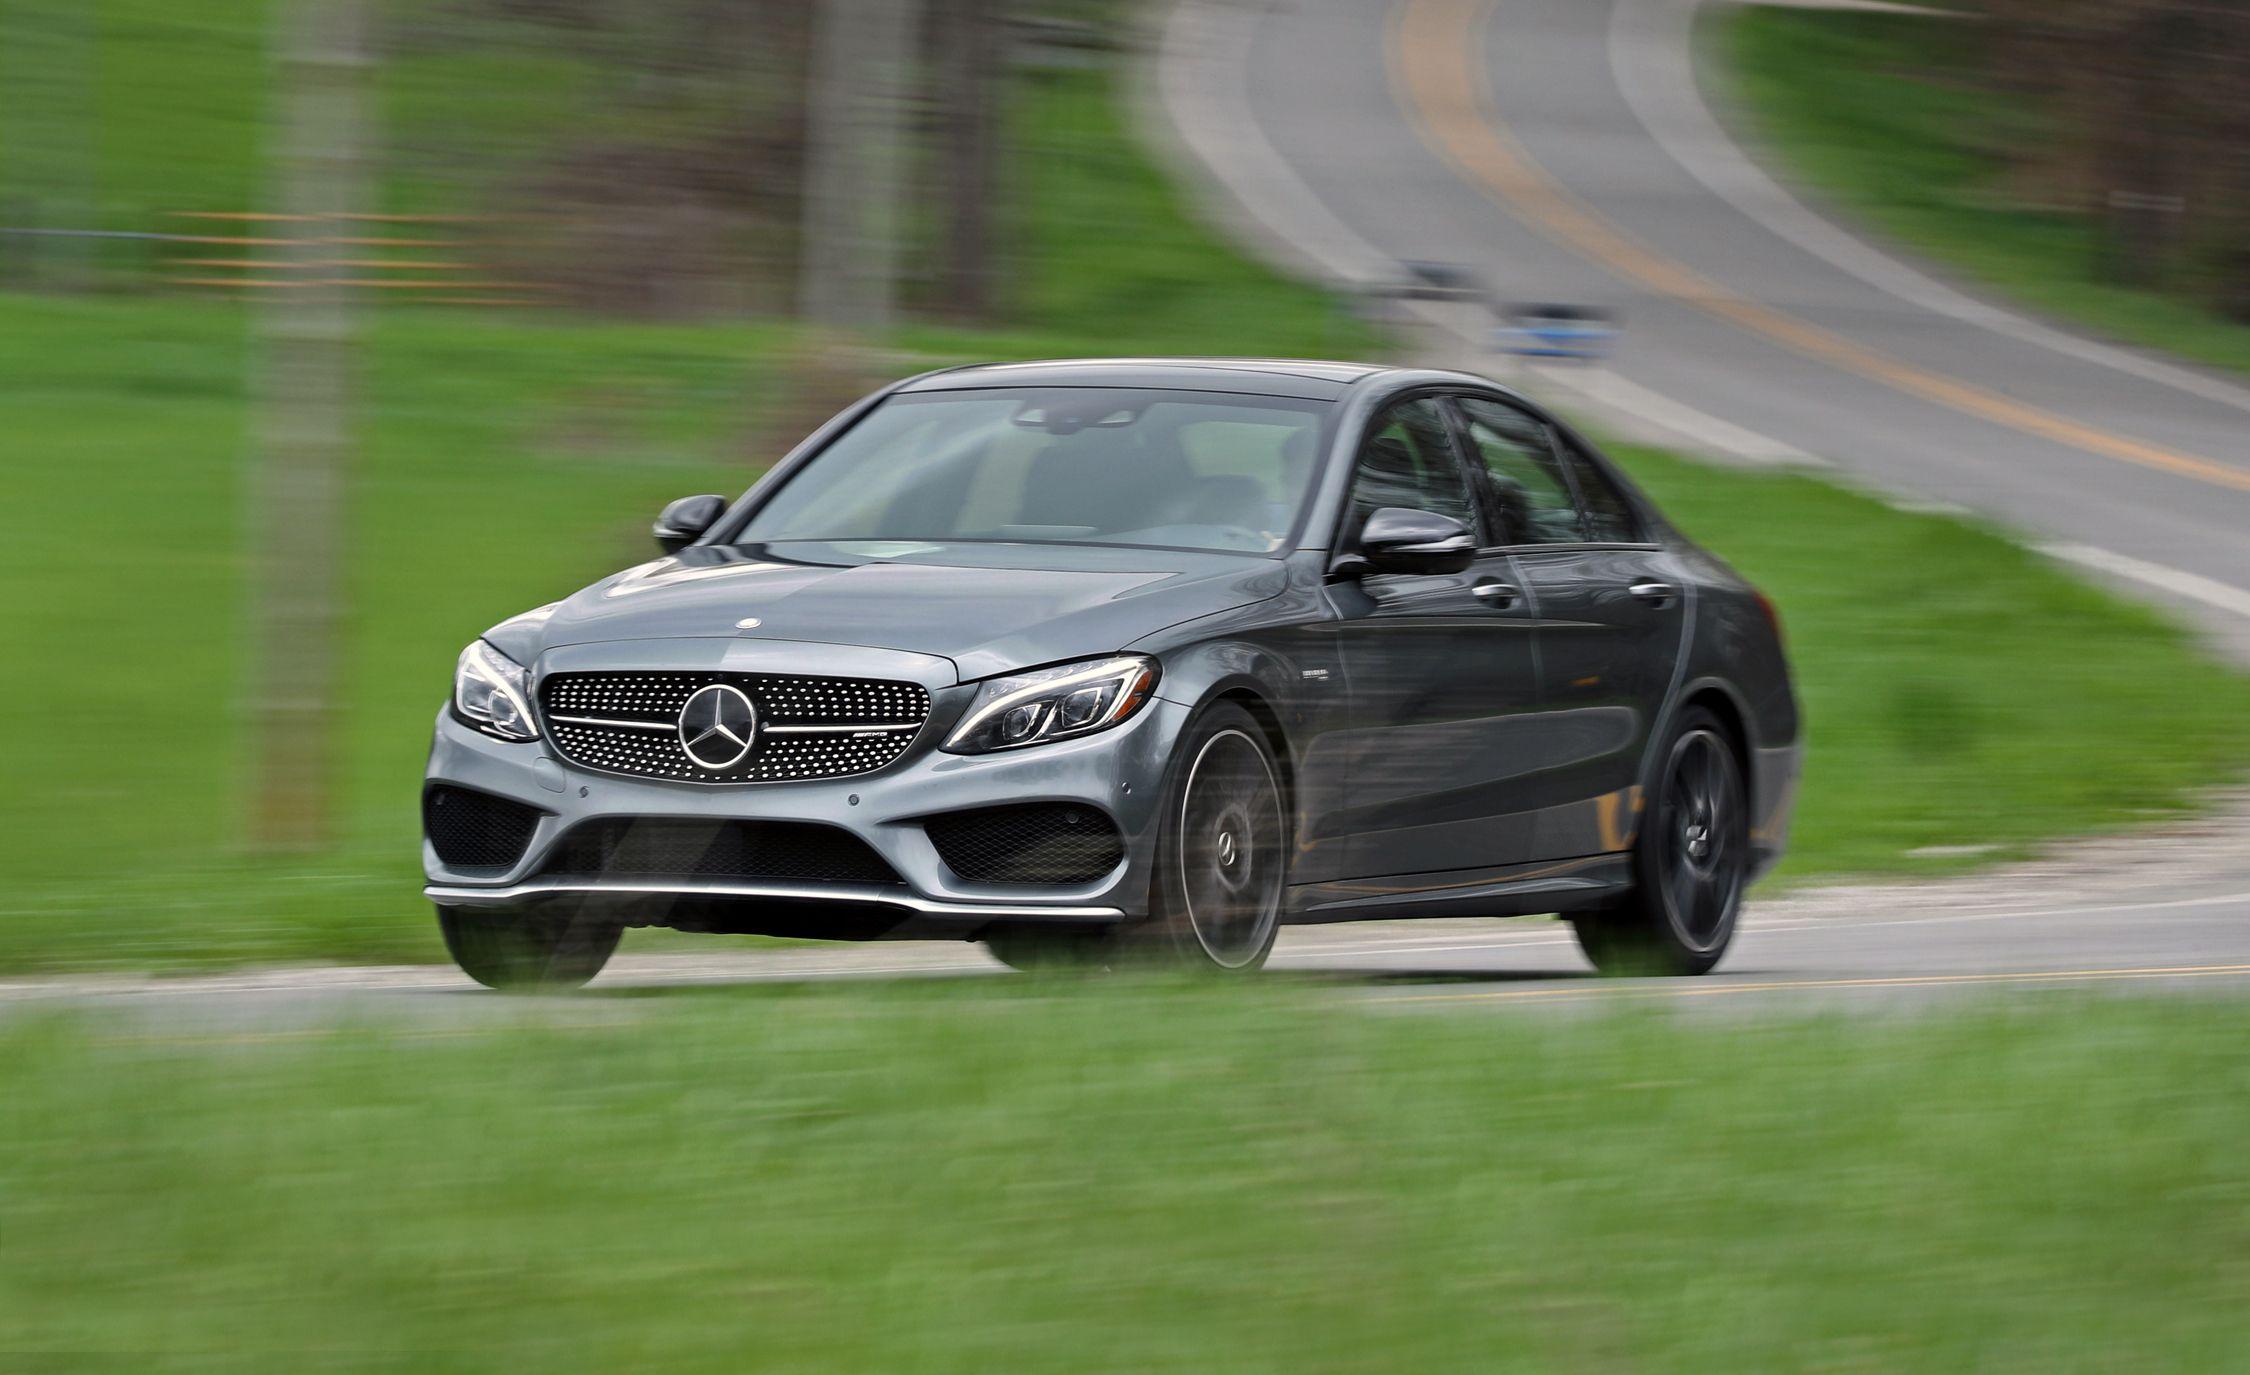 2020 Mercedes Amg C43 Review Pricing And Specs Avec Images Voiture Assurance Auto Auto